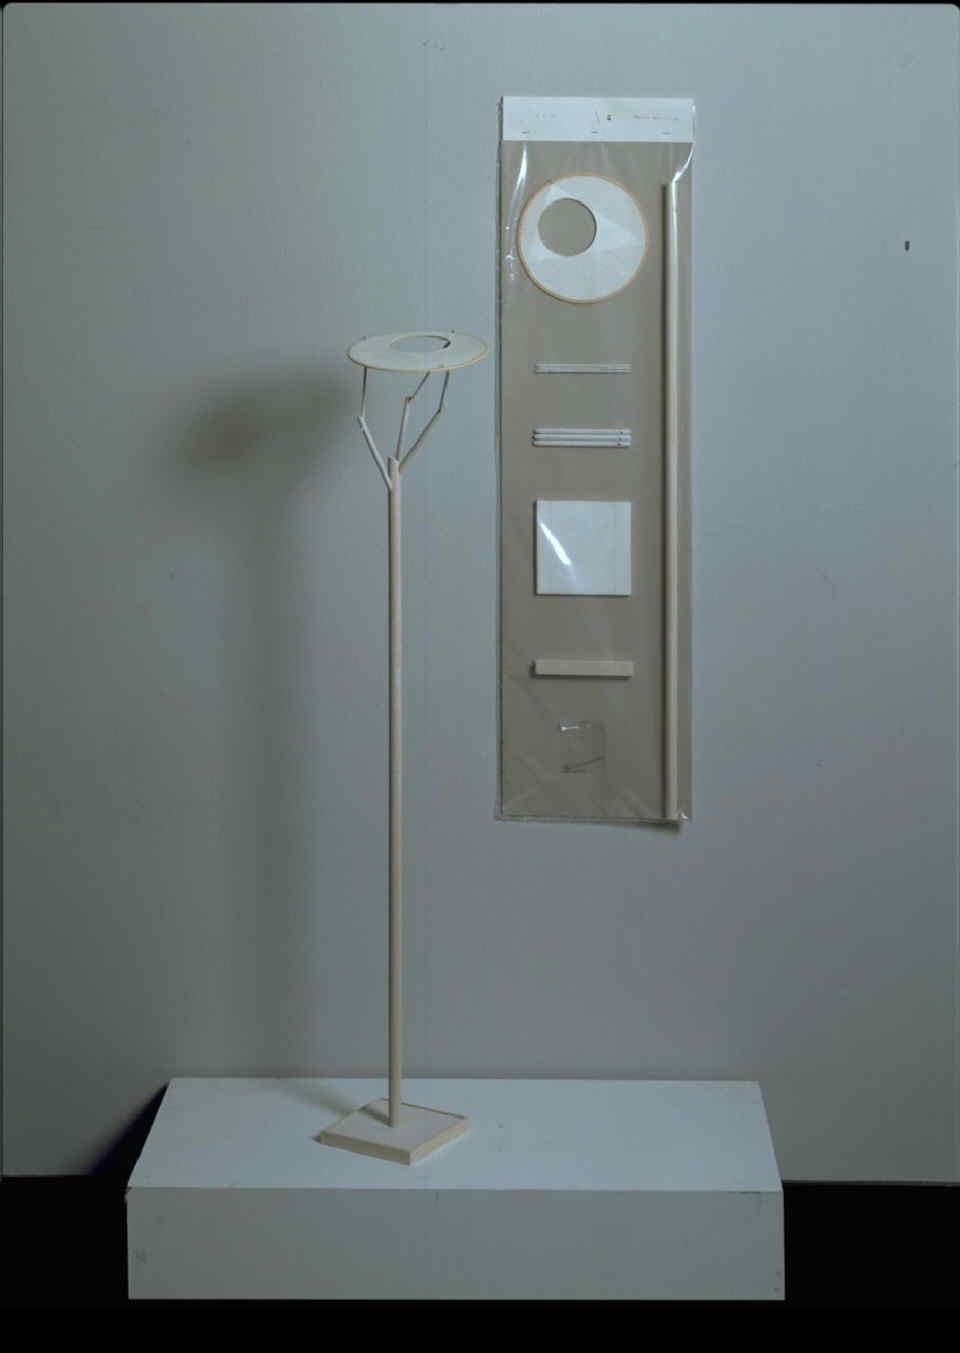 ¿Objeto artístico, objeto manufacturado?